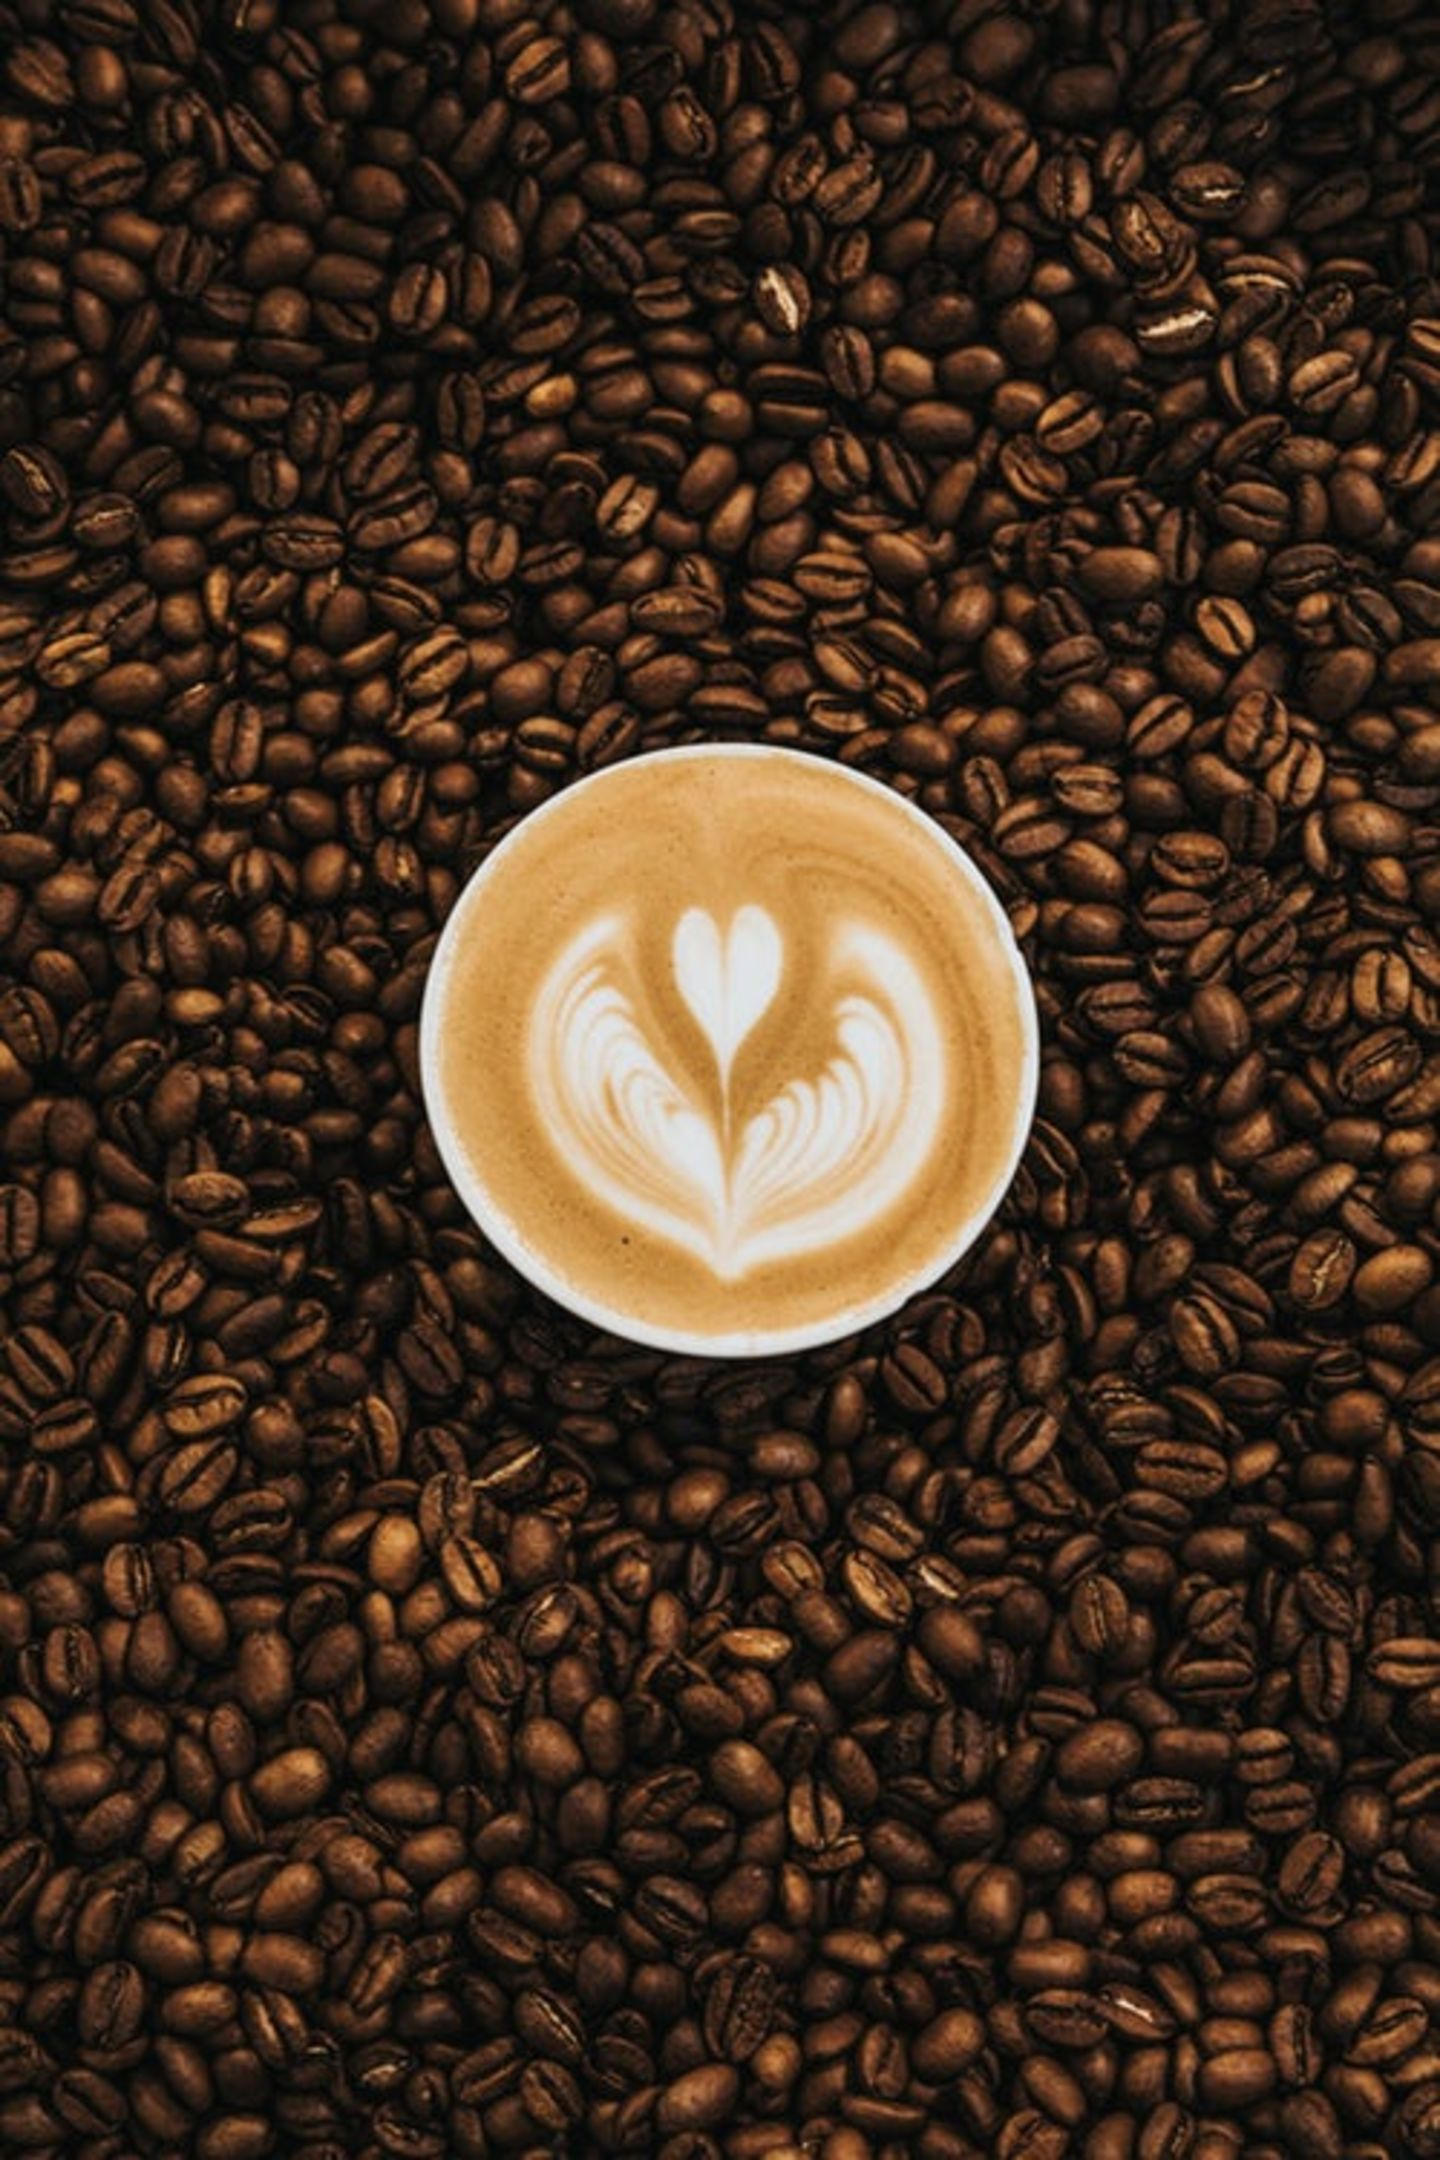 HiDubai-business-exit-coffee-shop-food-beverage-coffee-shops-dubai-motor-city-al-hebiah-1-dubai